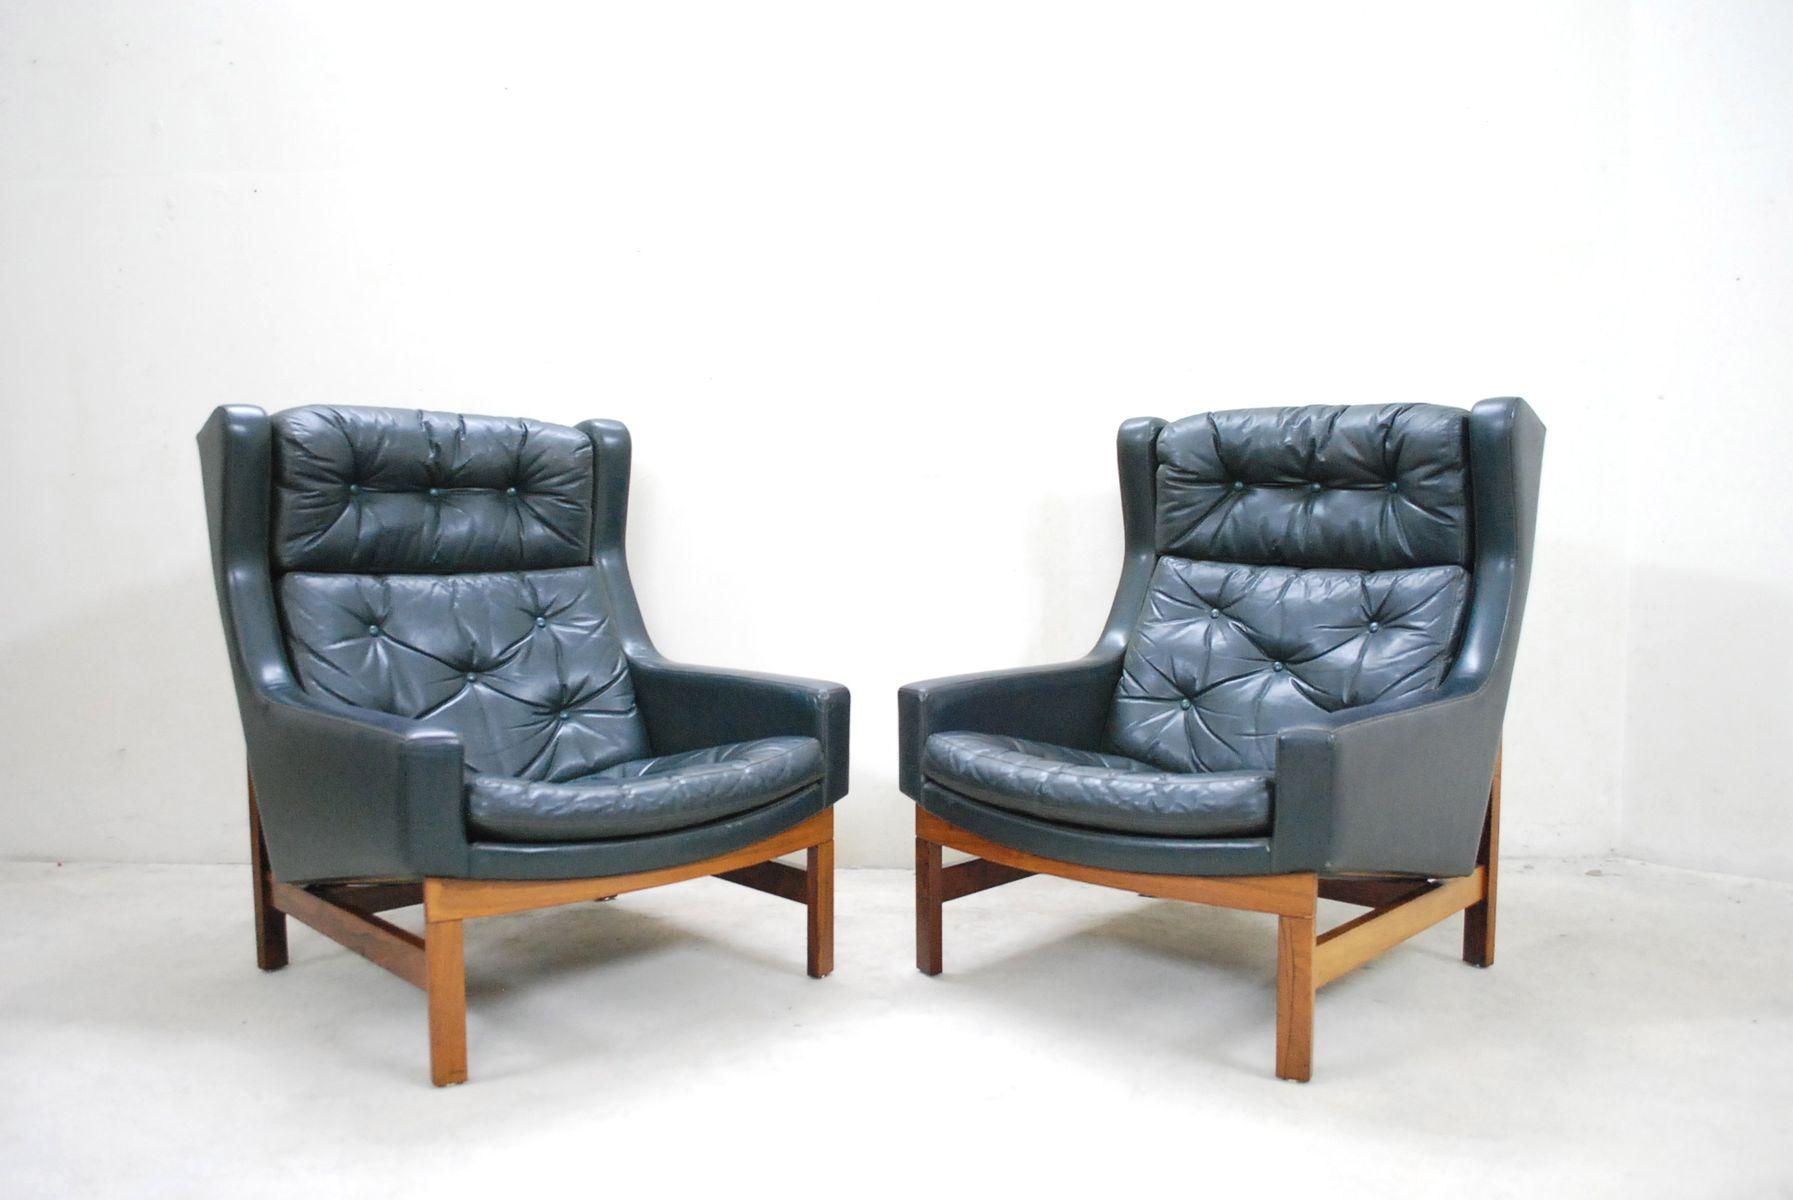 gr ner palisander geschwungener sessel 1975 bei pamono kaufen. Black Bedroom Furniture Sets. Home Design Ideas